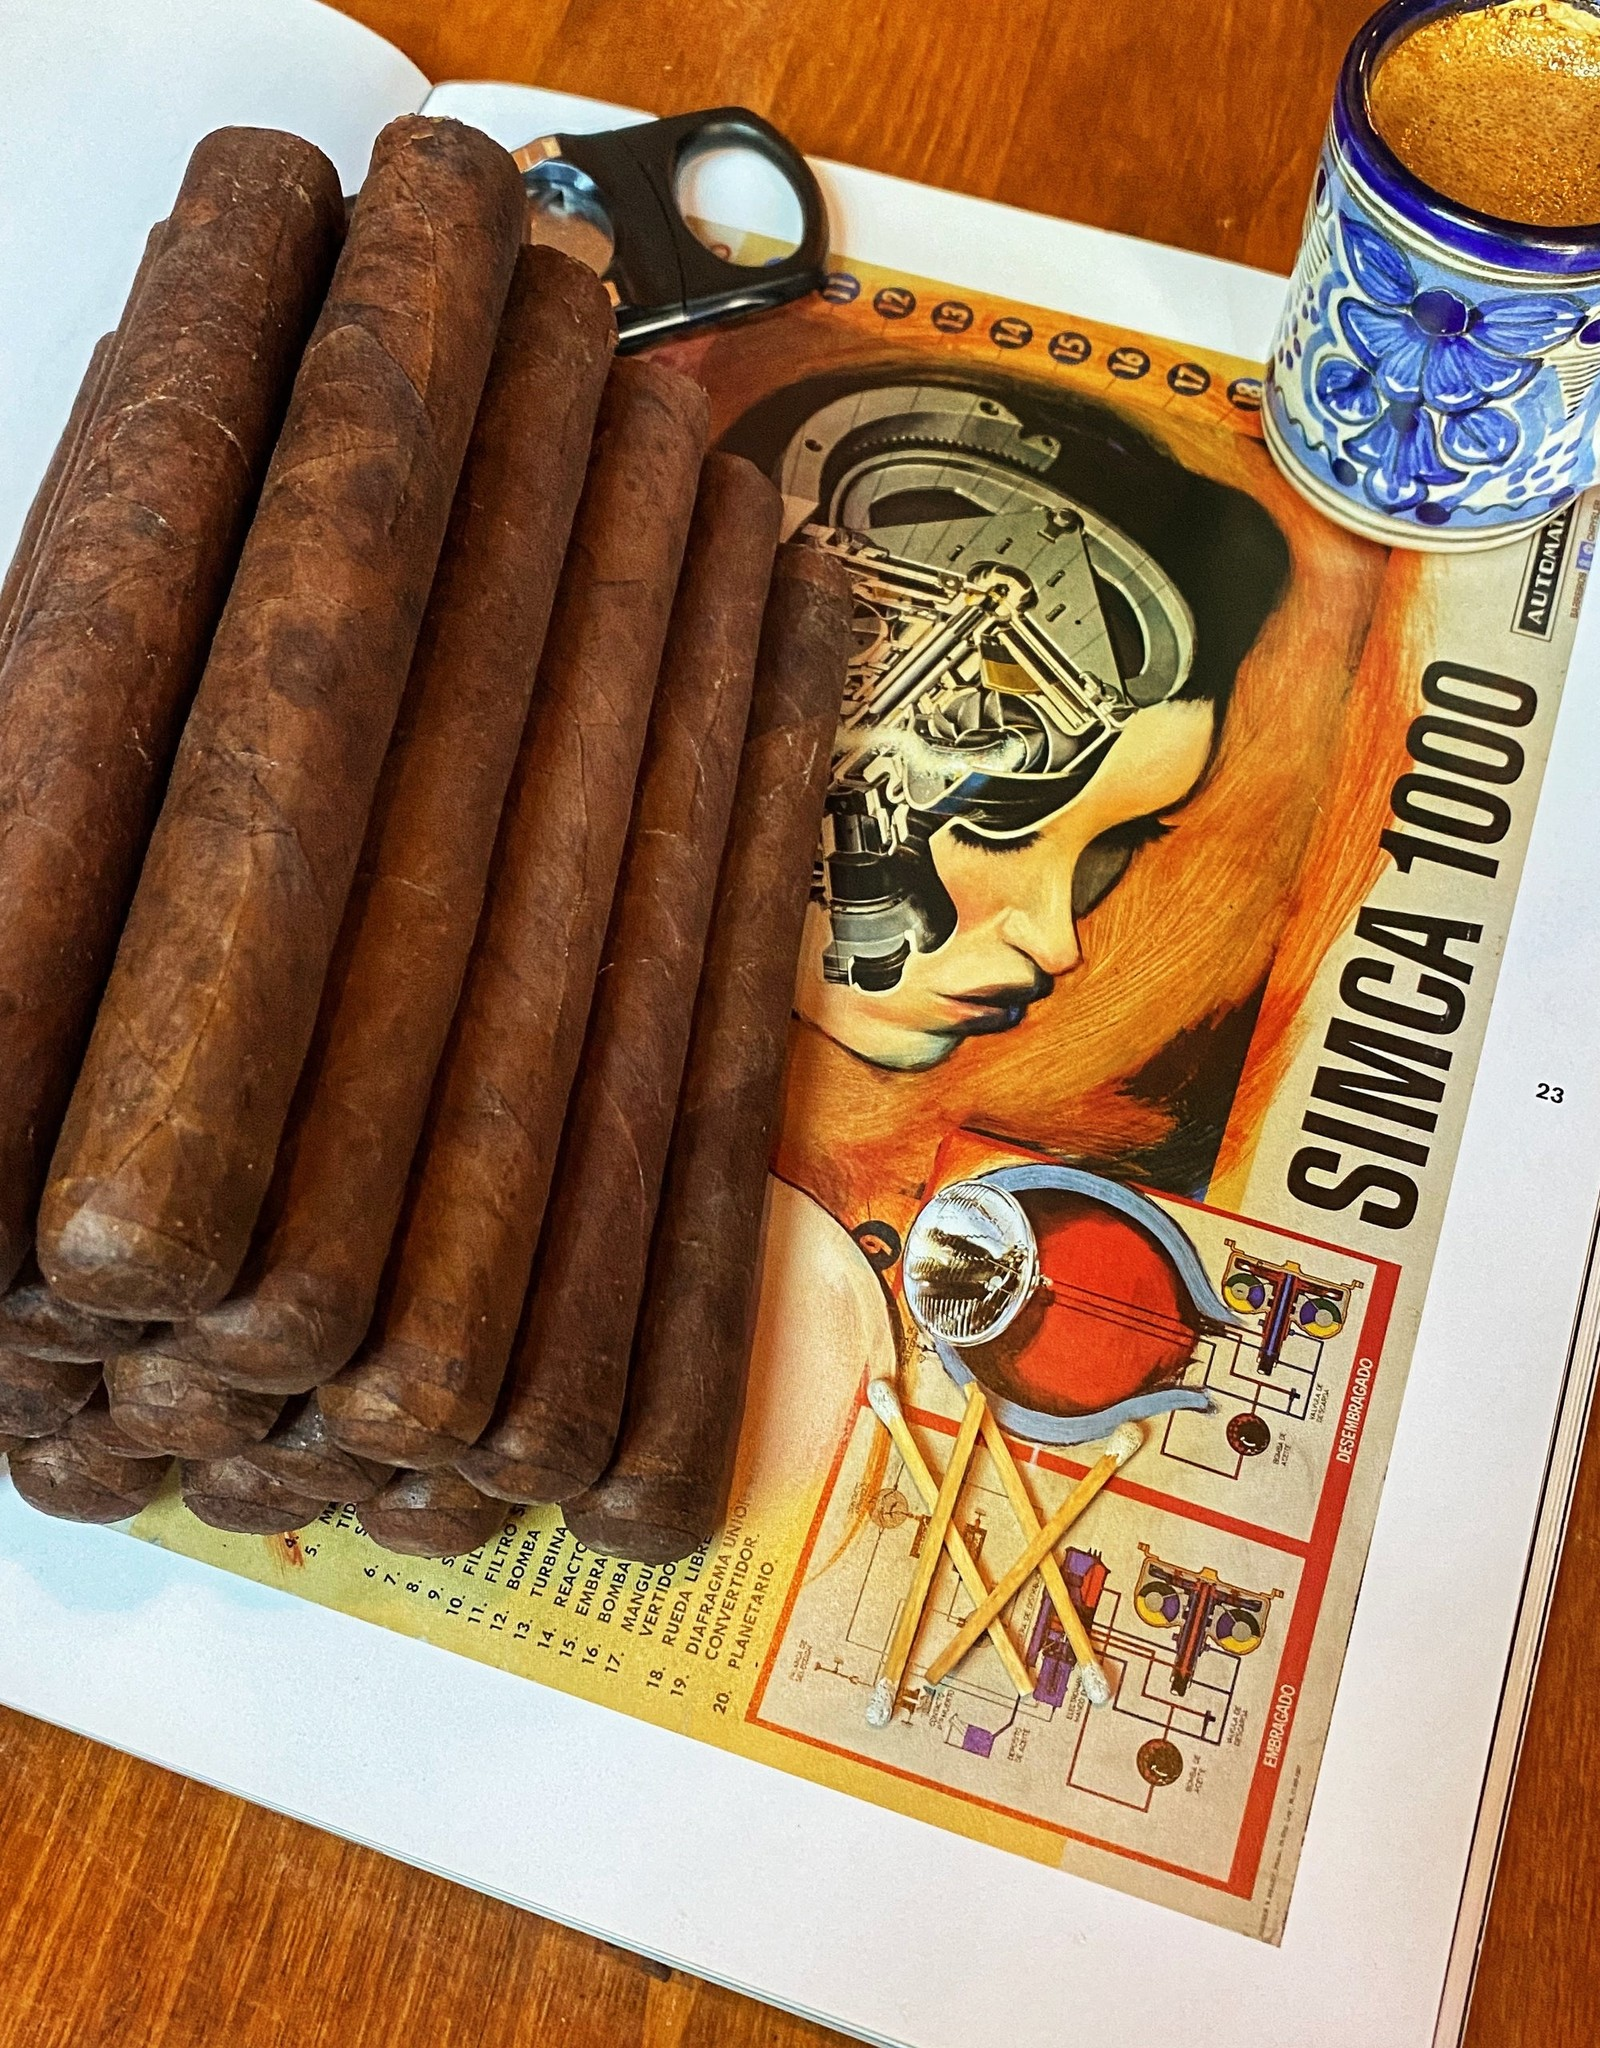 The Second Line Maduro Toro 6 x 50 Bundle of 20